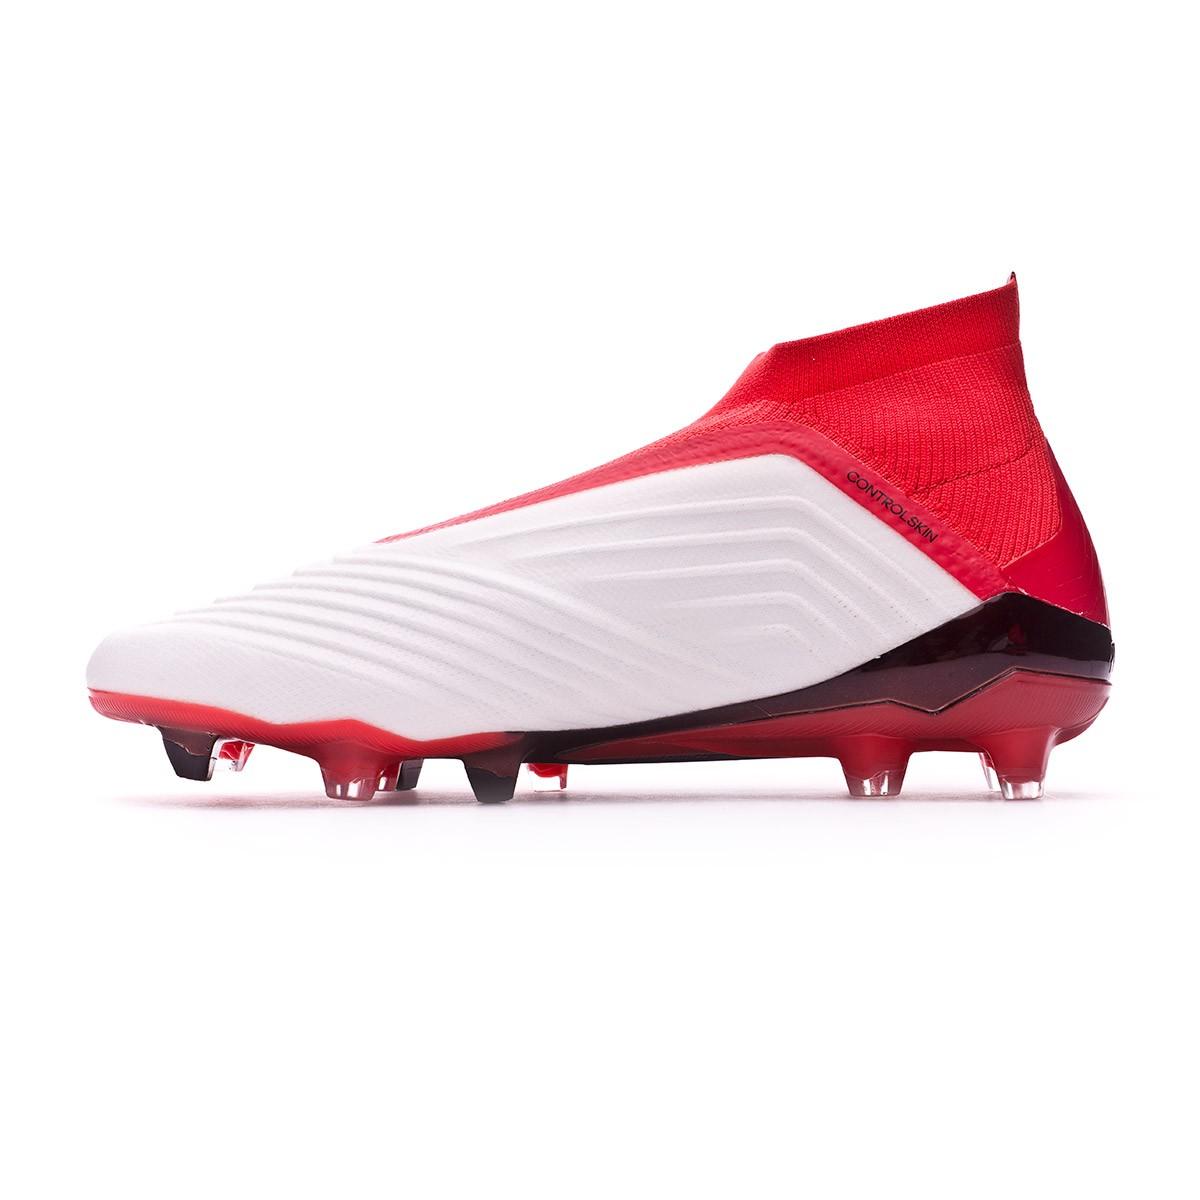 0cdab43862fa Football Boots adidas Predator 18+ FG White-Core black-Real coral - Tienda  de fútbol Fútbol Emotion